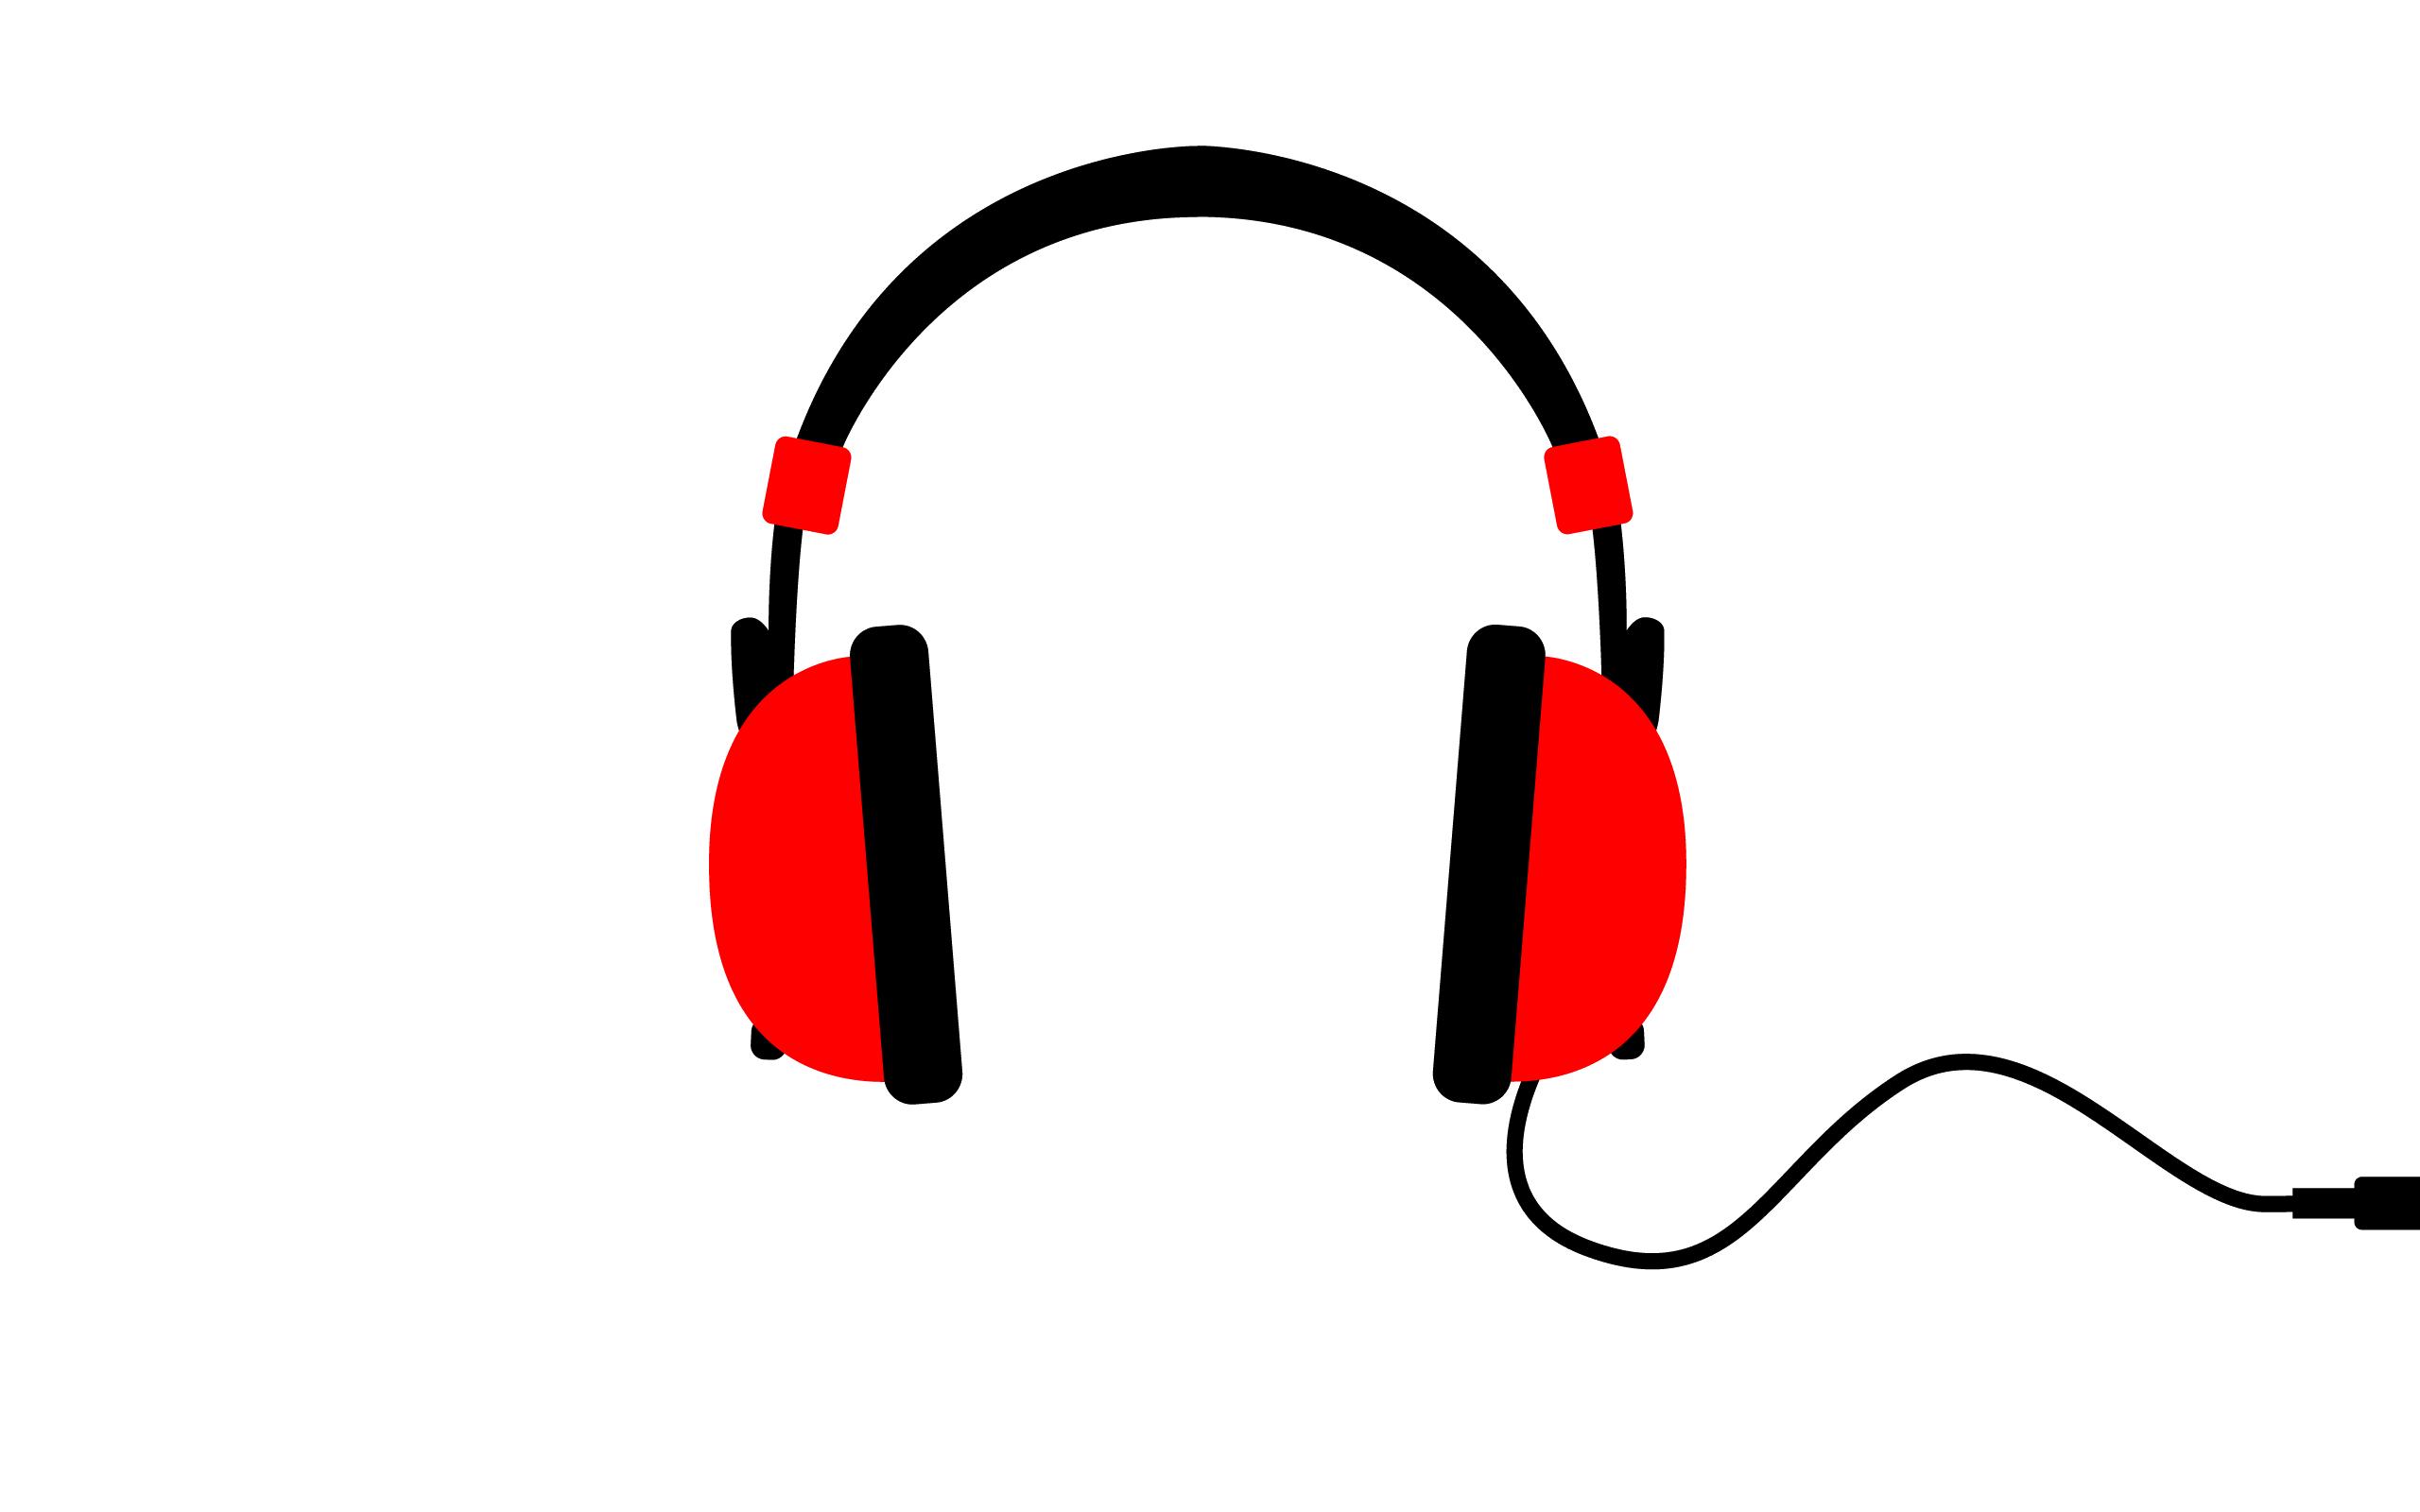 Free Headphones Clip Art, Headphones Free Clipart.